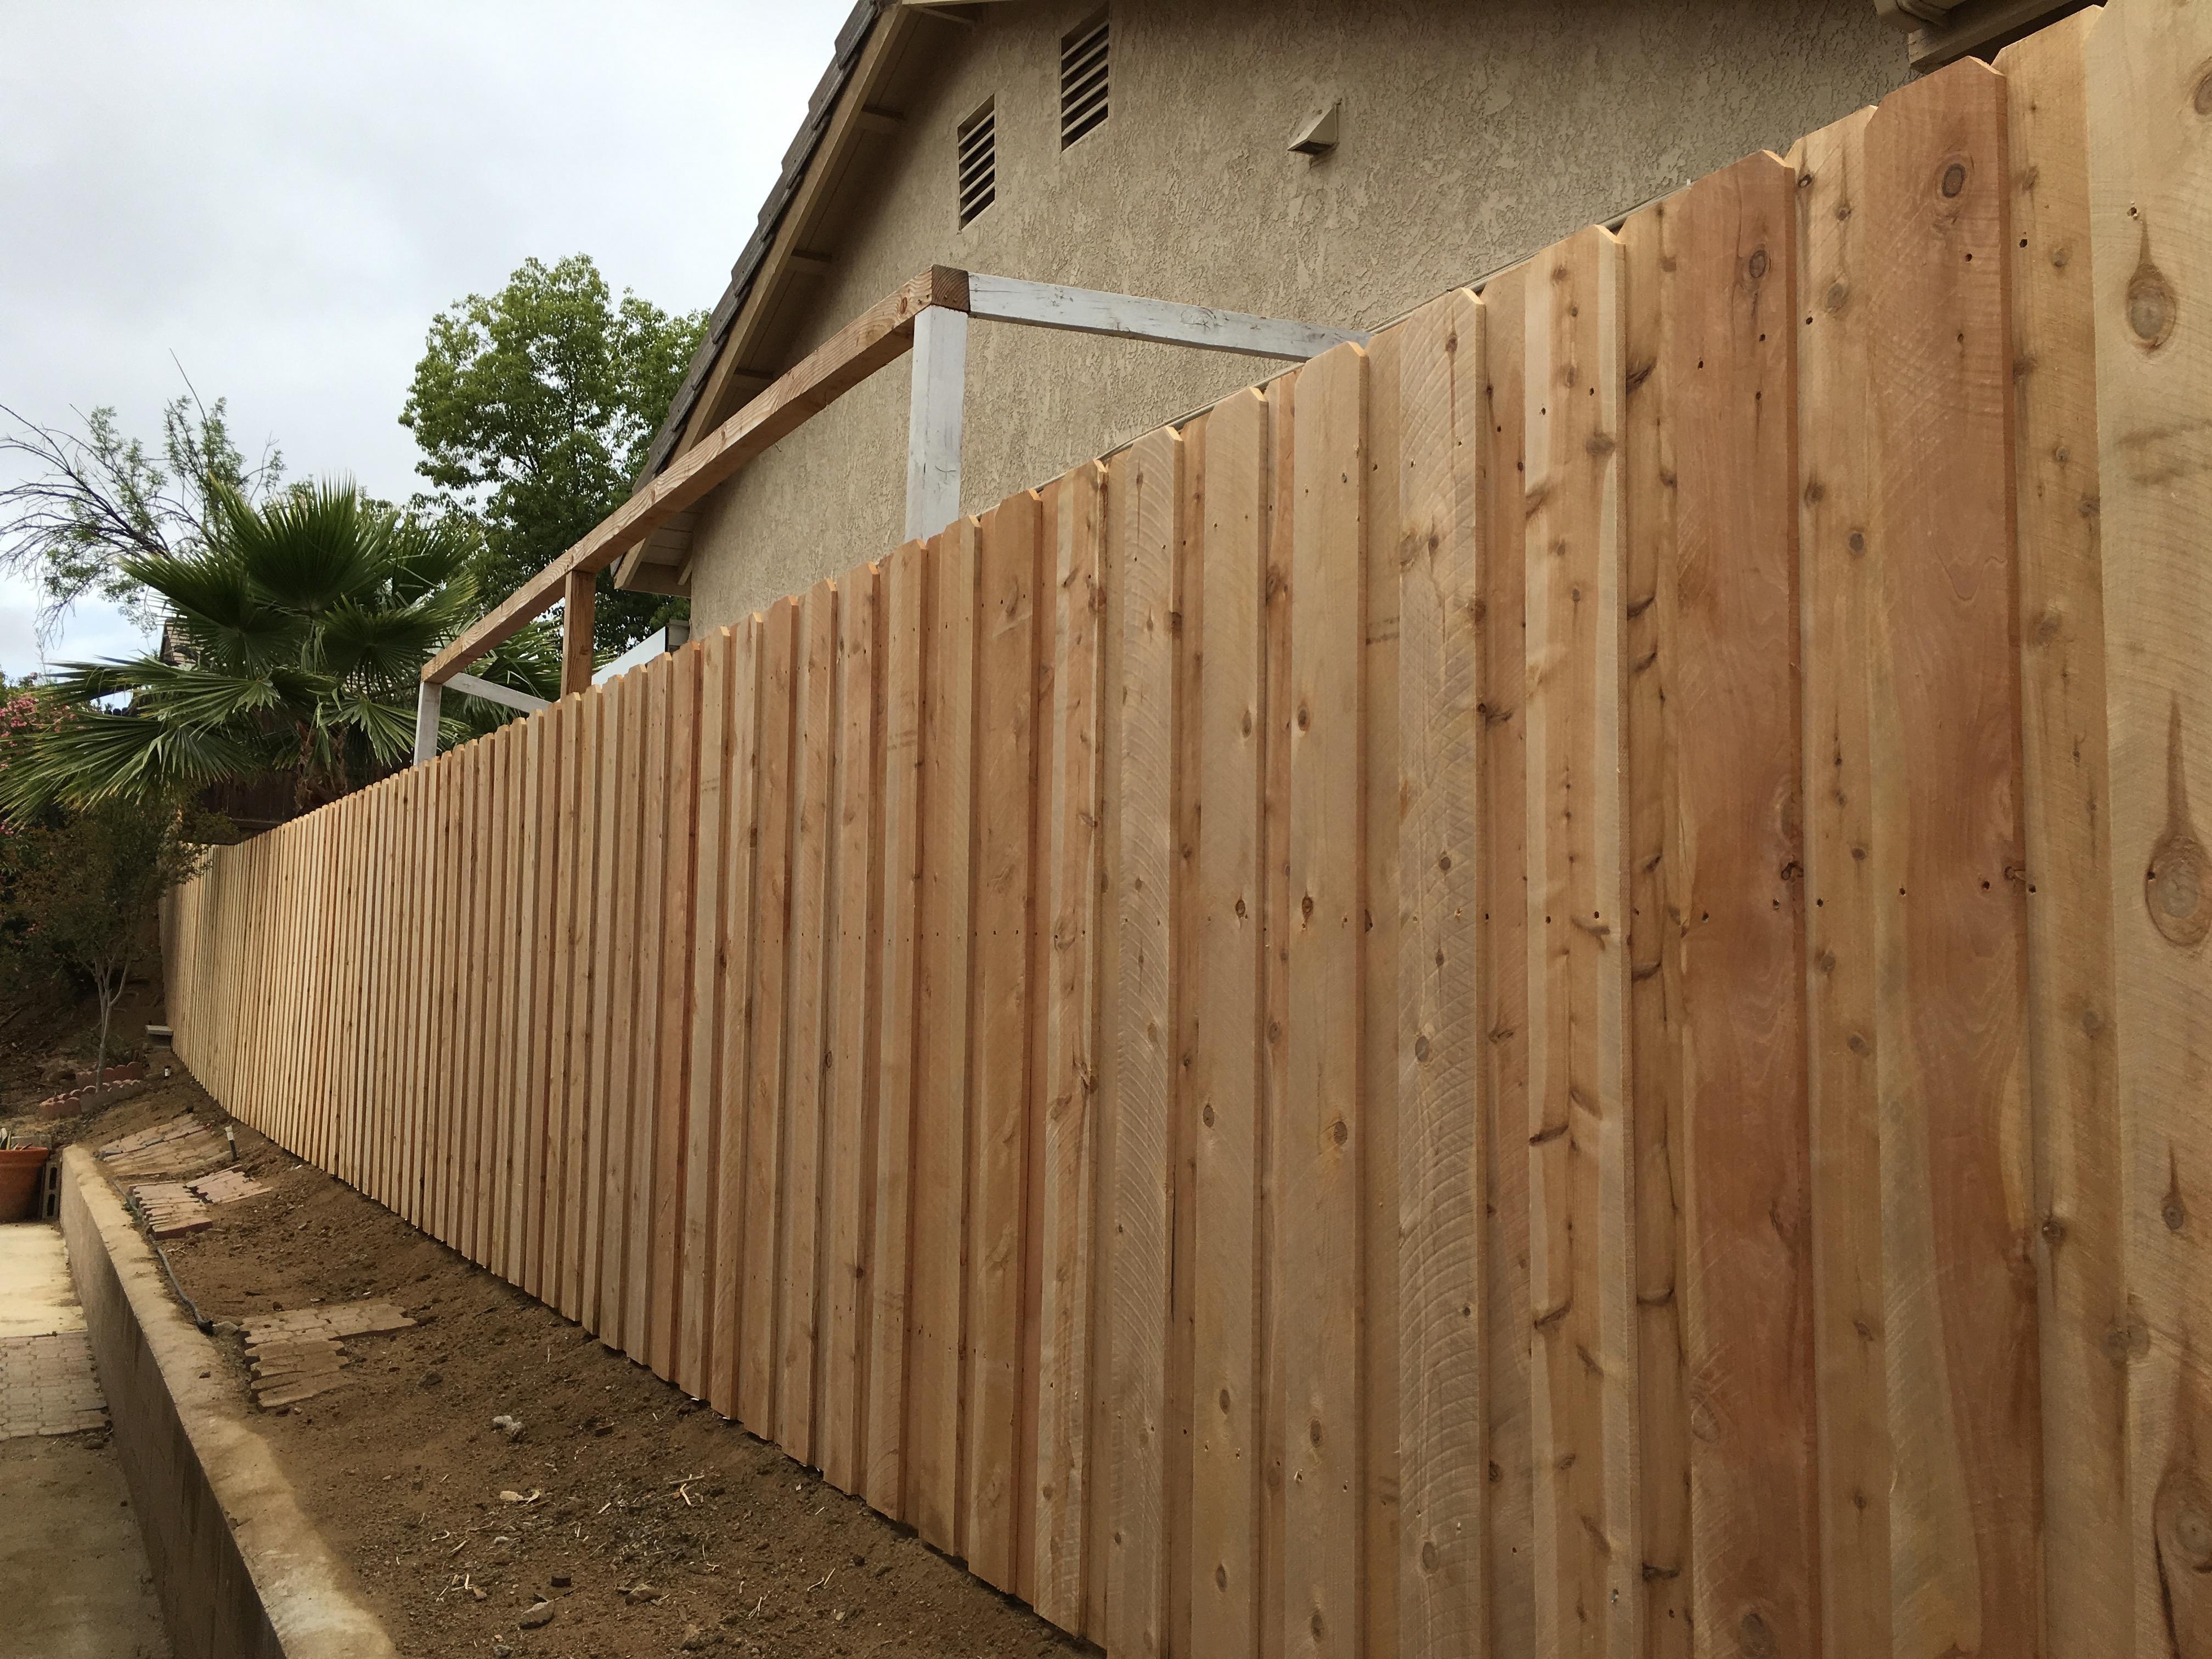 3T Fence image 19